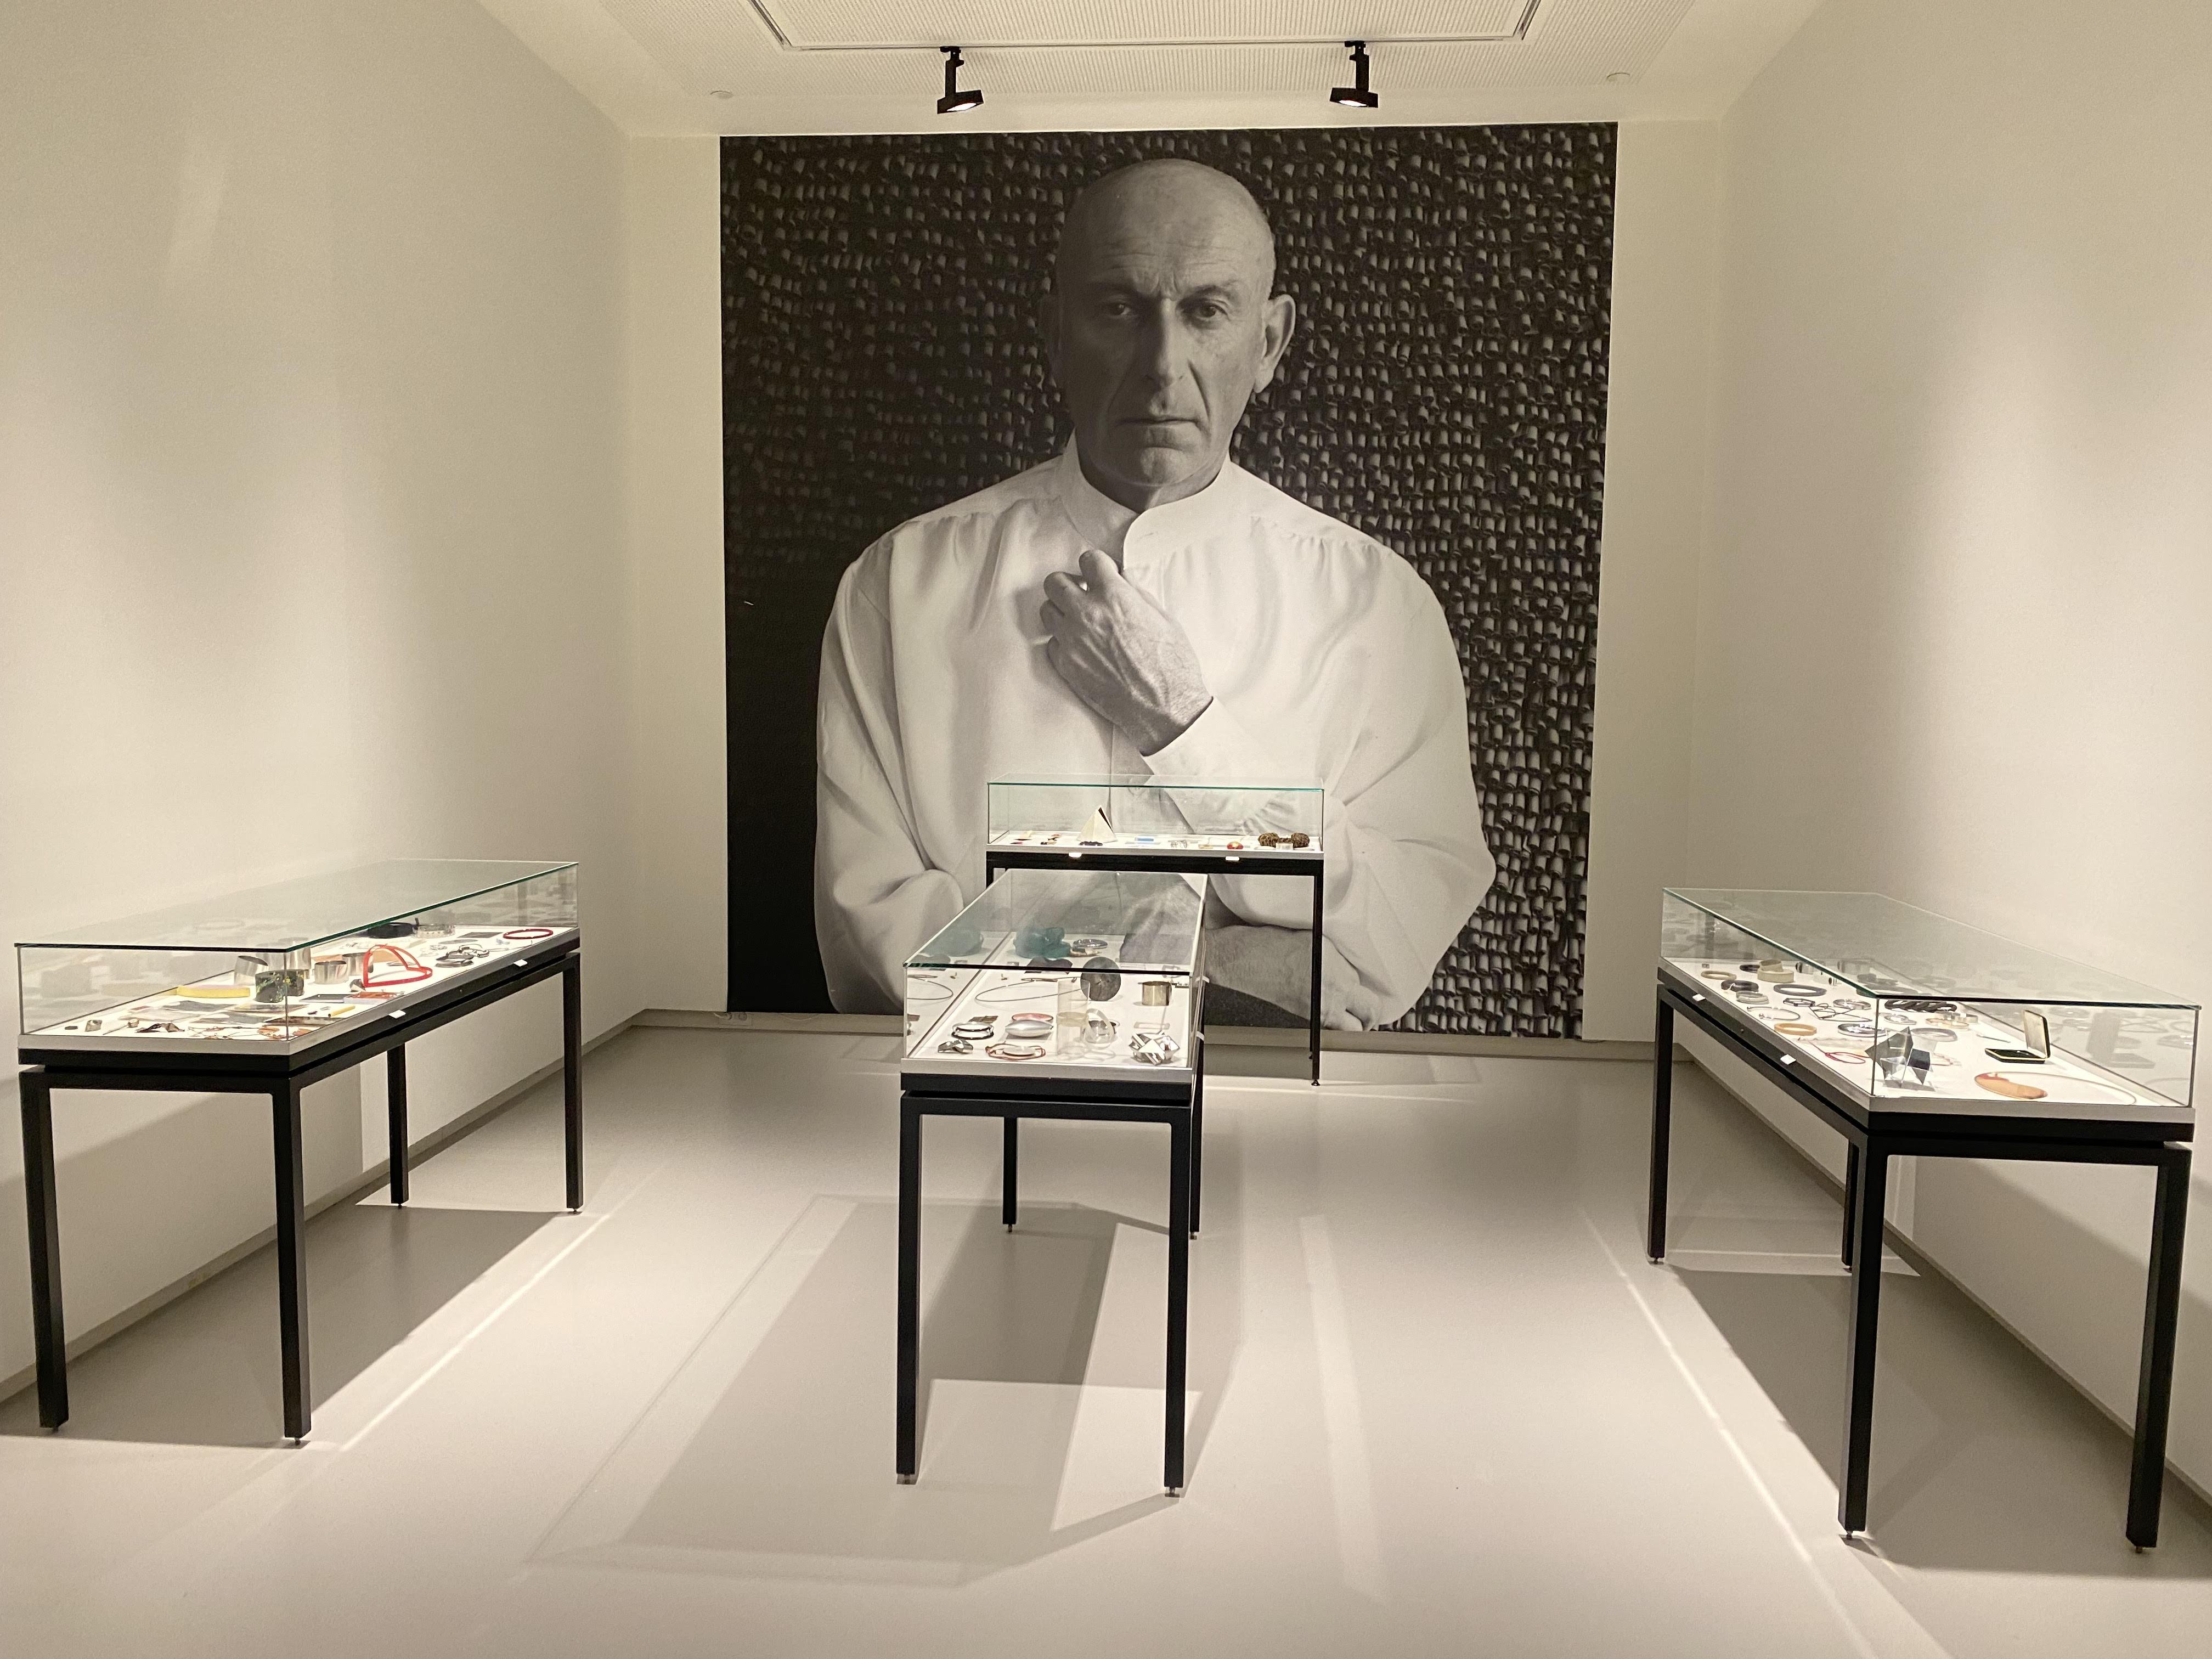 Collectie Benno Premsela, Design Museum Den Bosch, 2021. Foto Hans Appenzeller, portret, vitrines, tentoonstelling